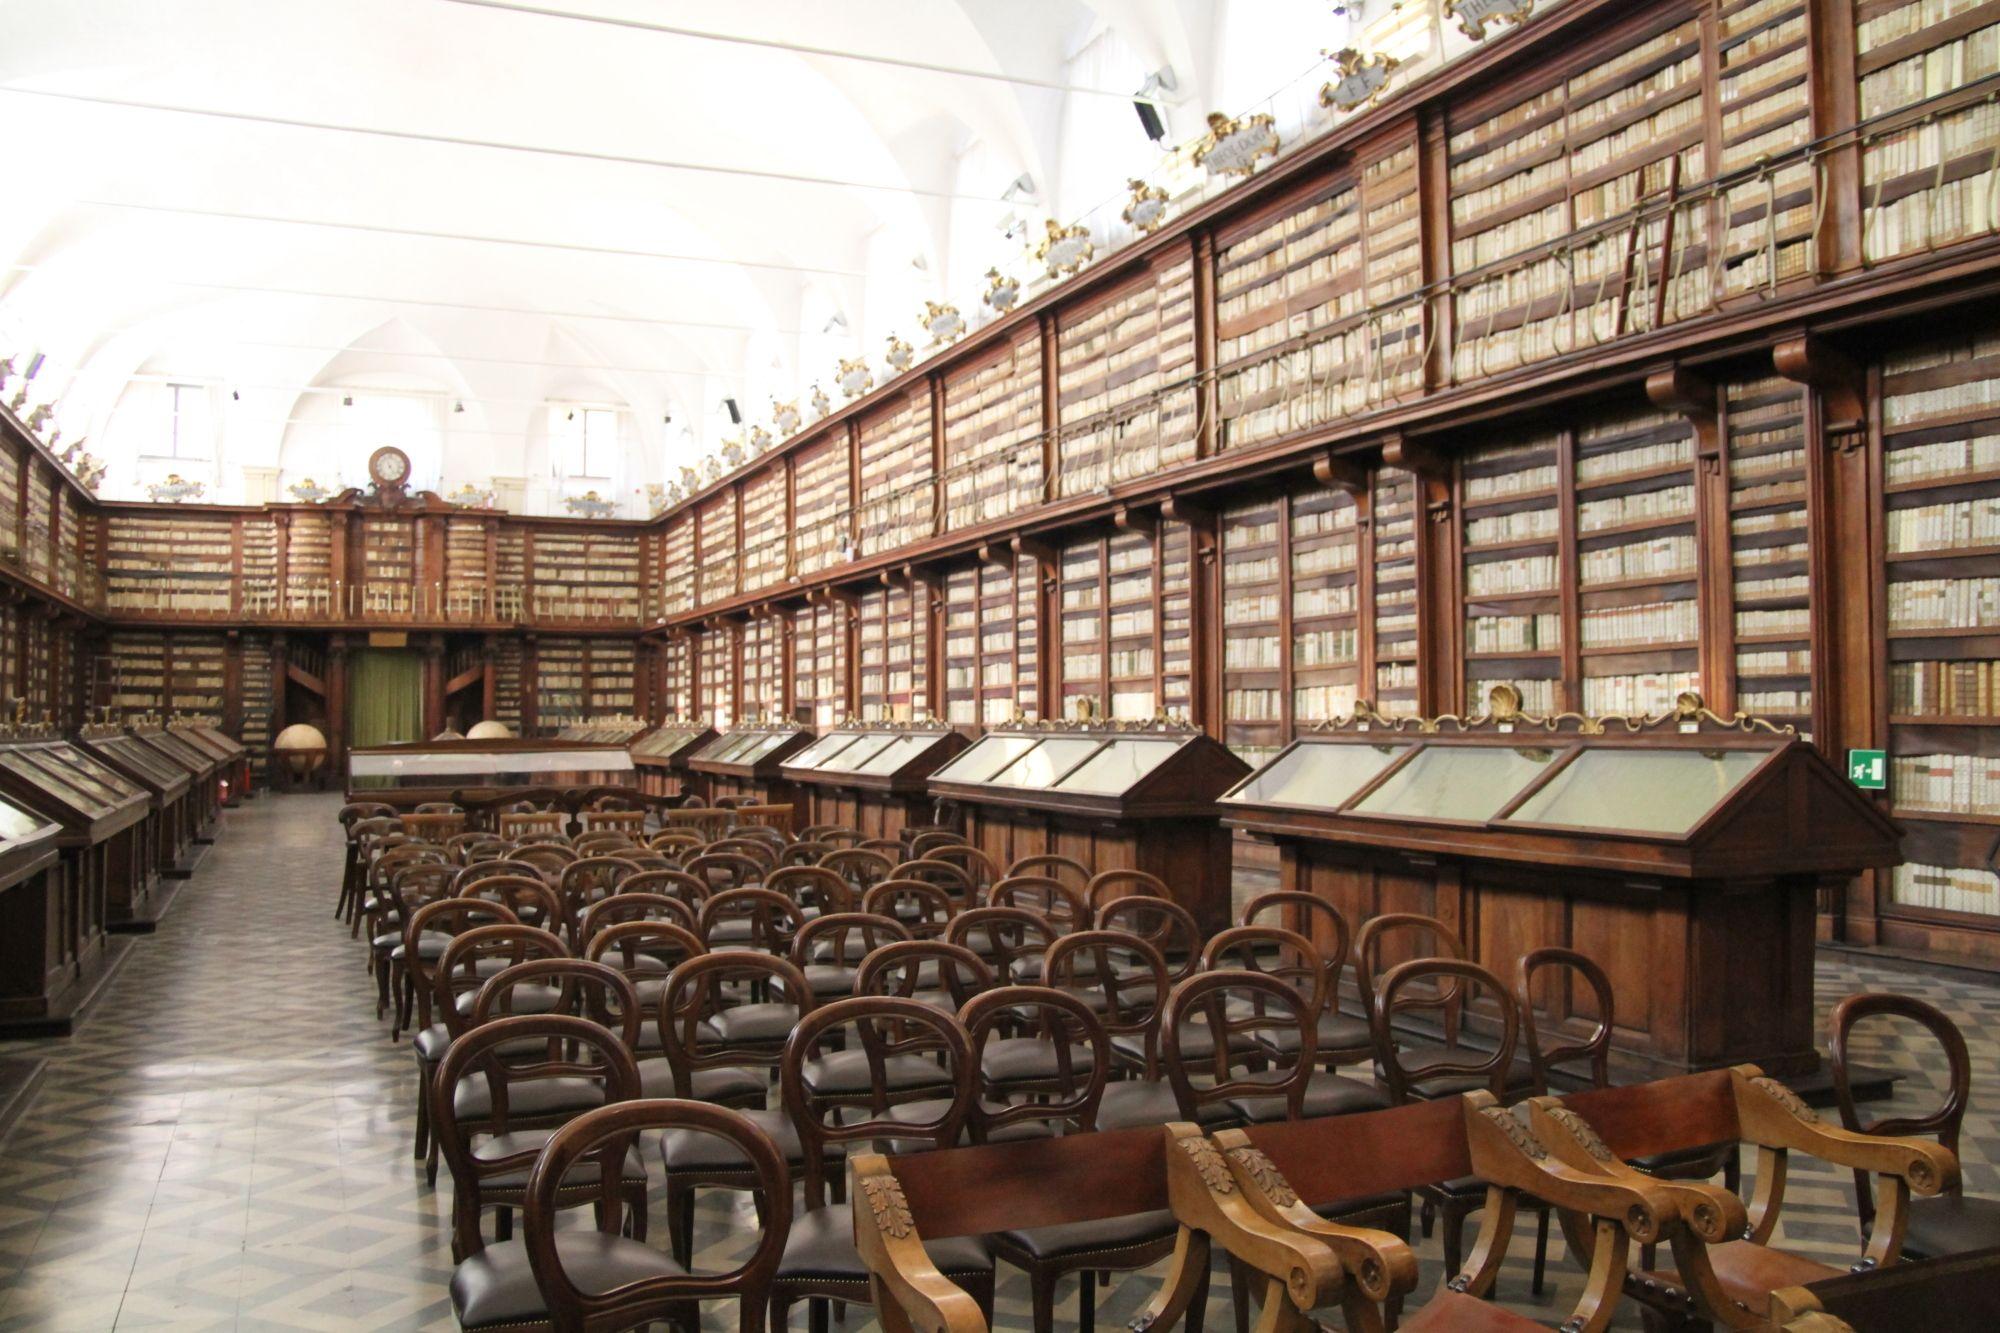 biblioteca orbassano san luigi rome - photo#11